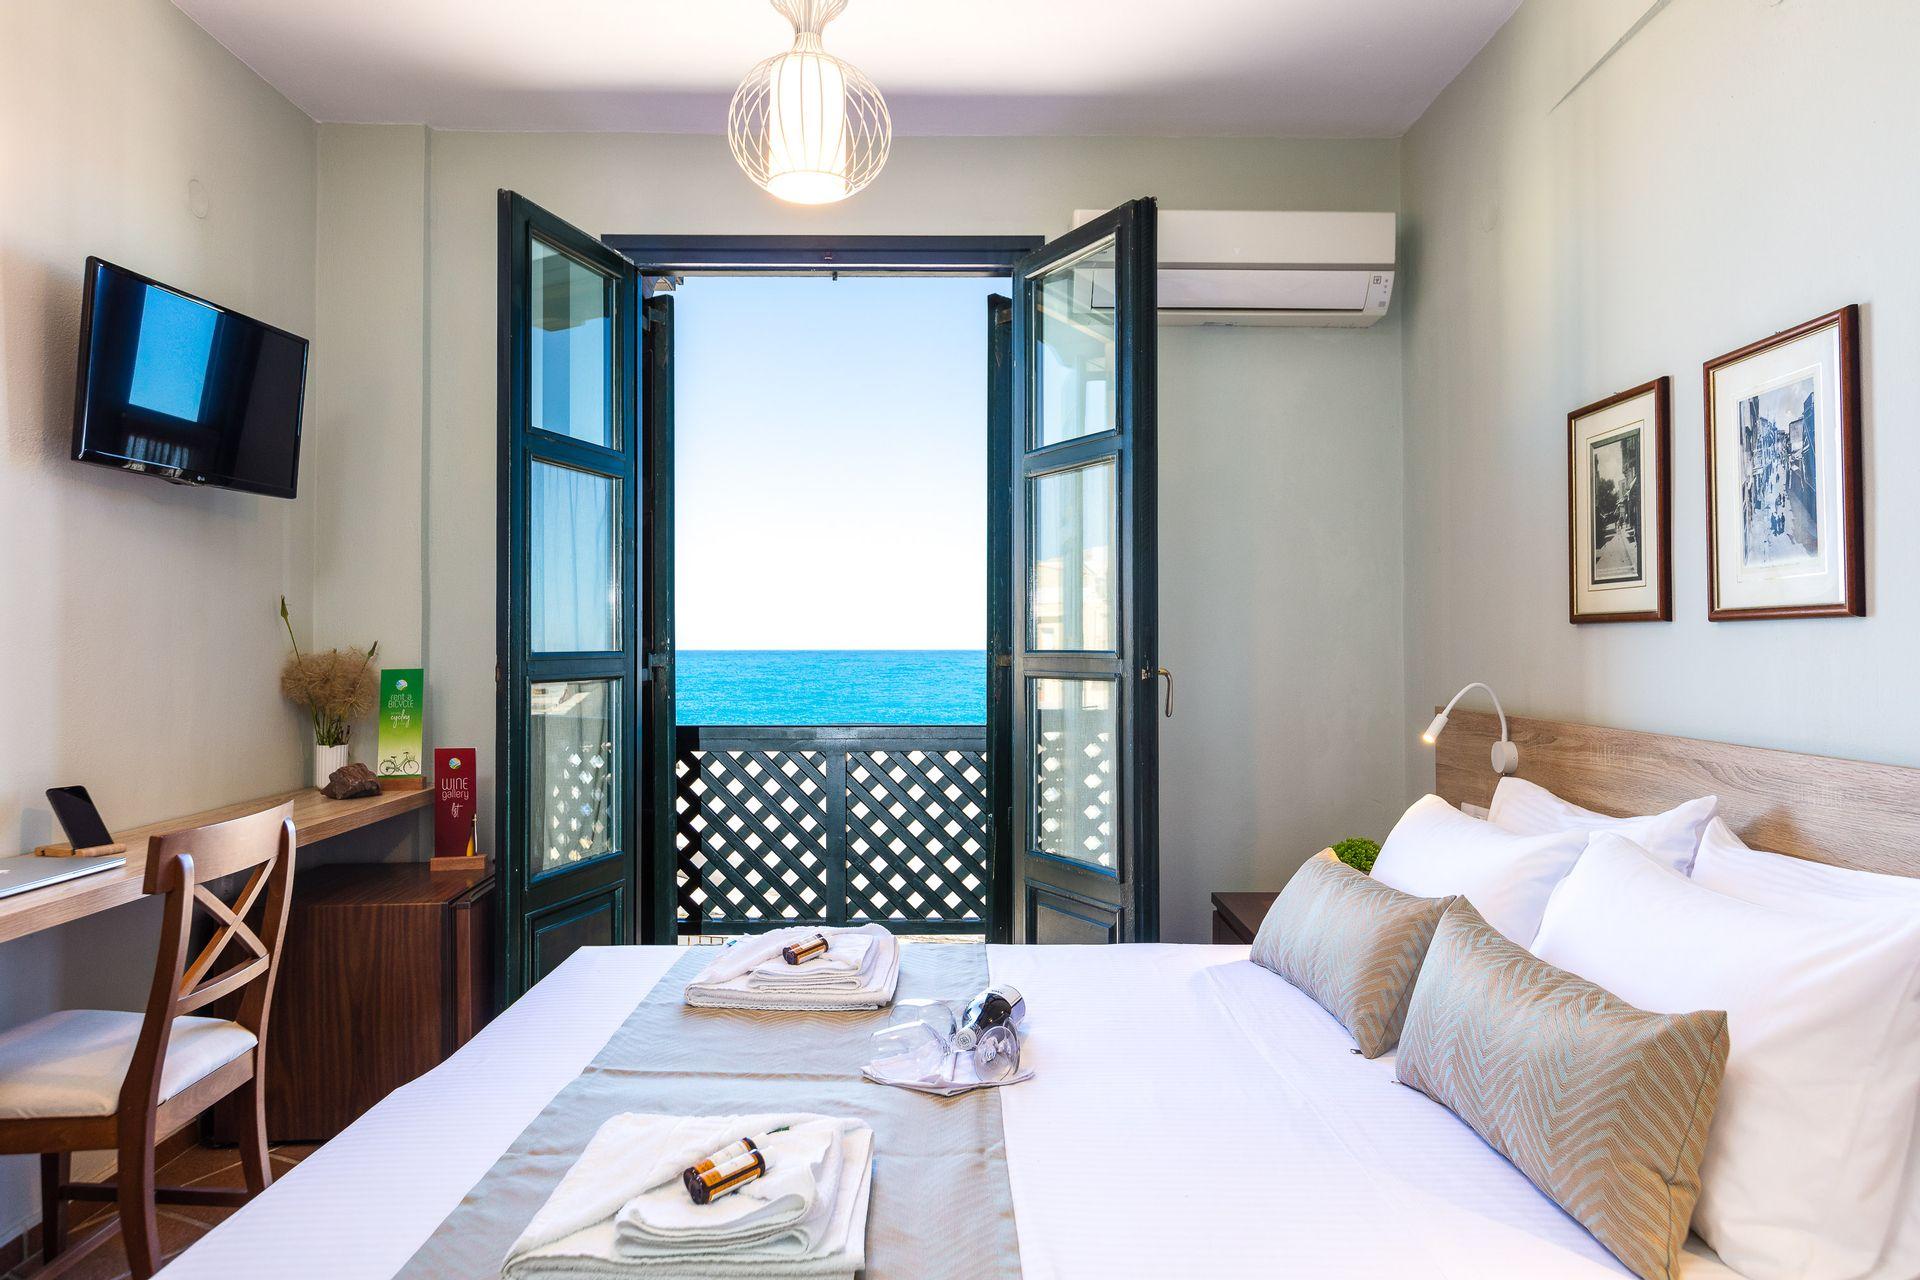 Ink Hotel House of Europe Rethymno - Ρέθυμνο ✦ 2 Ημέρες